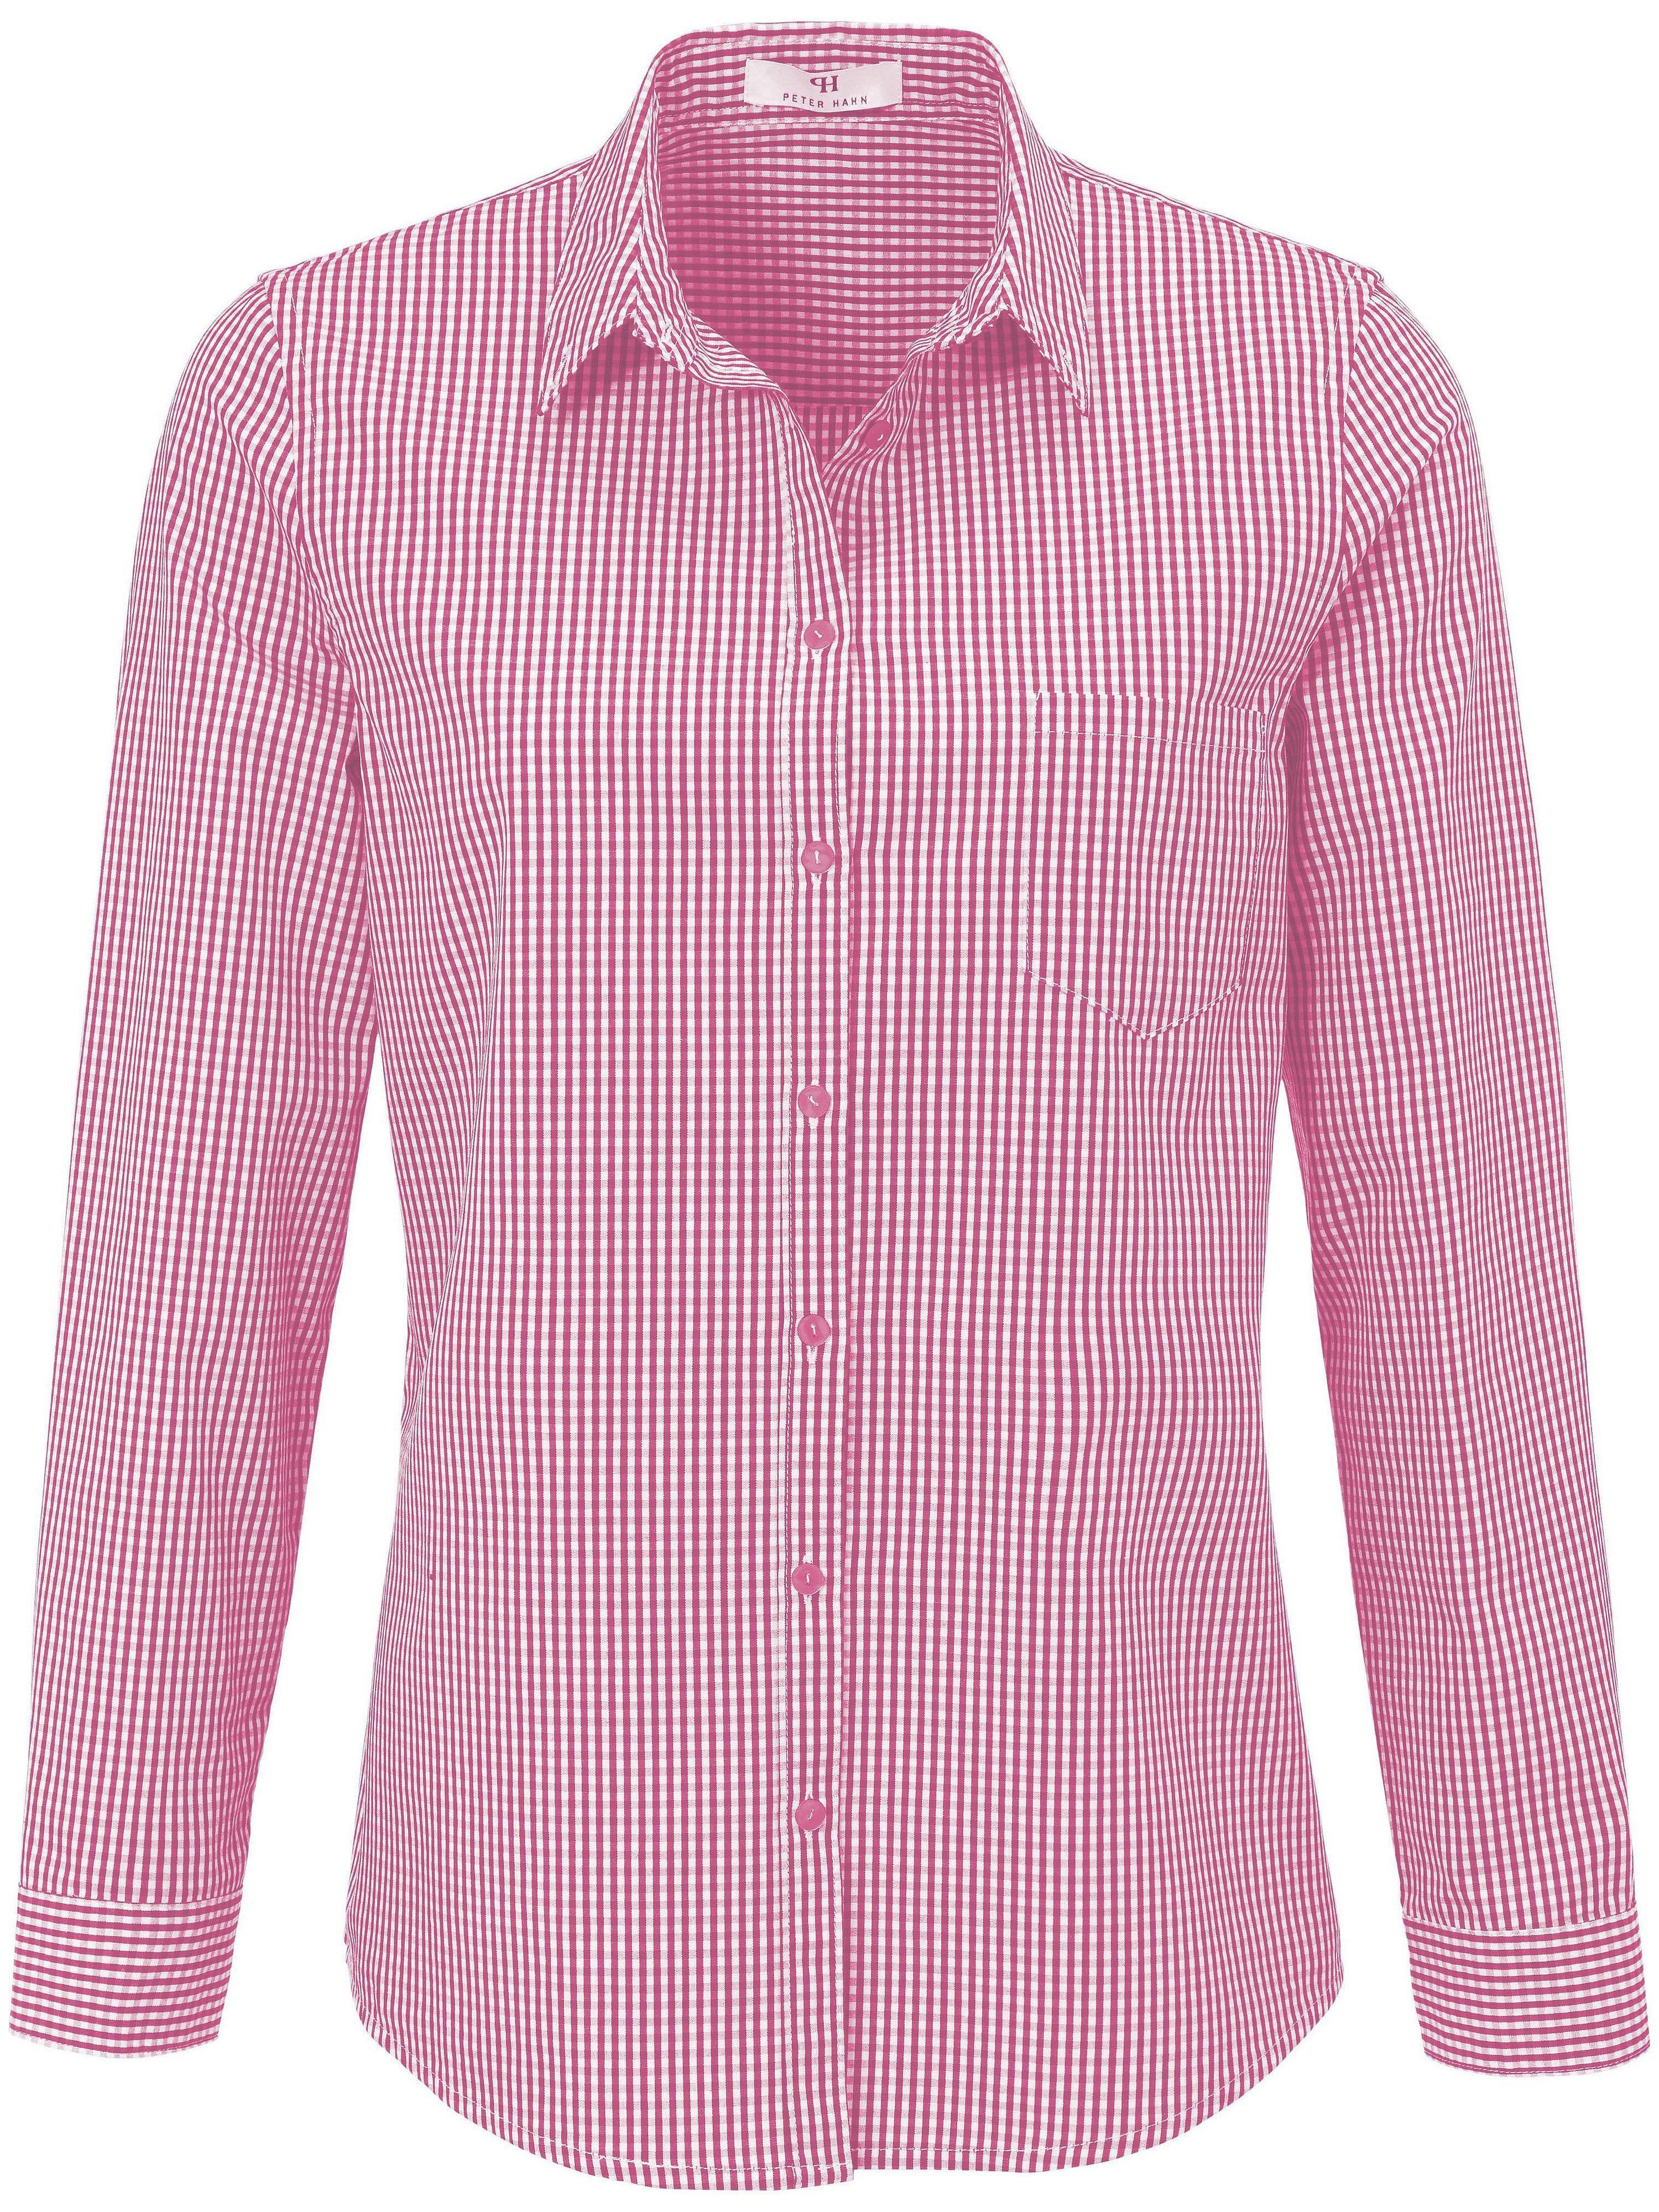 Blouse in overhemdmodel 100% katoen Van Peter Hahn roze